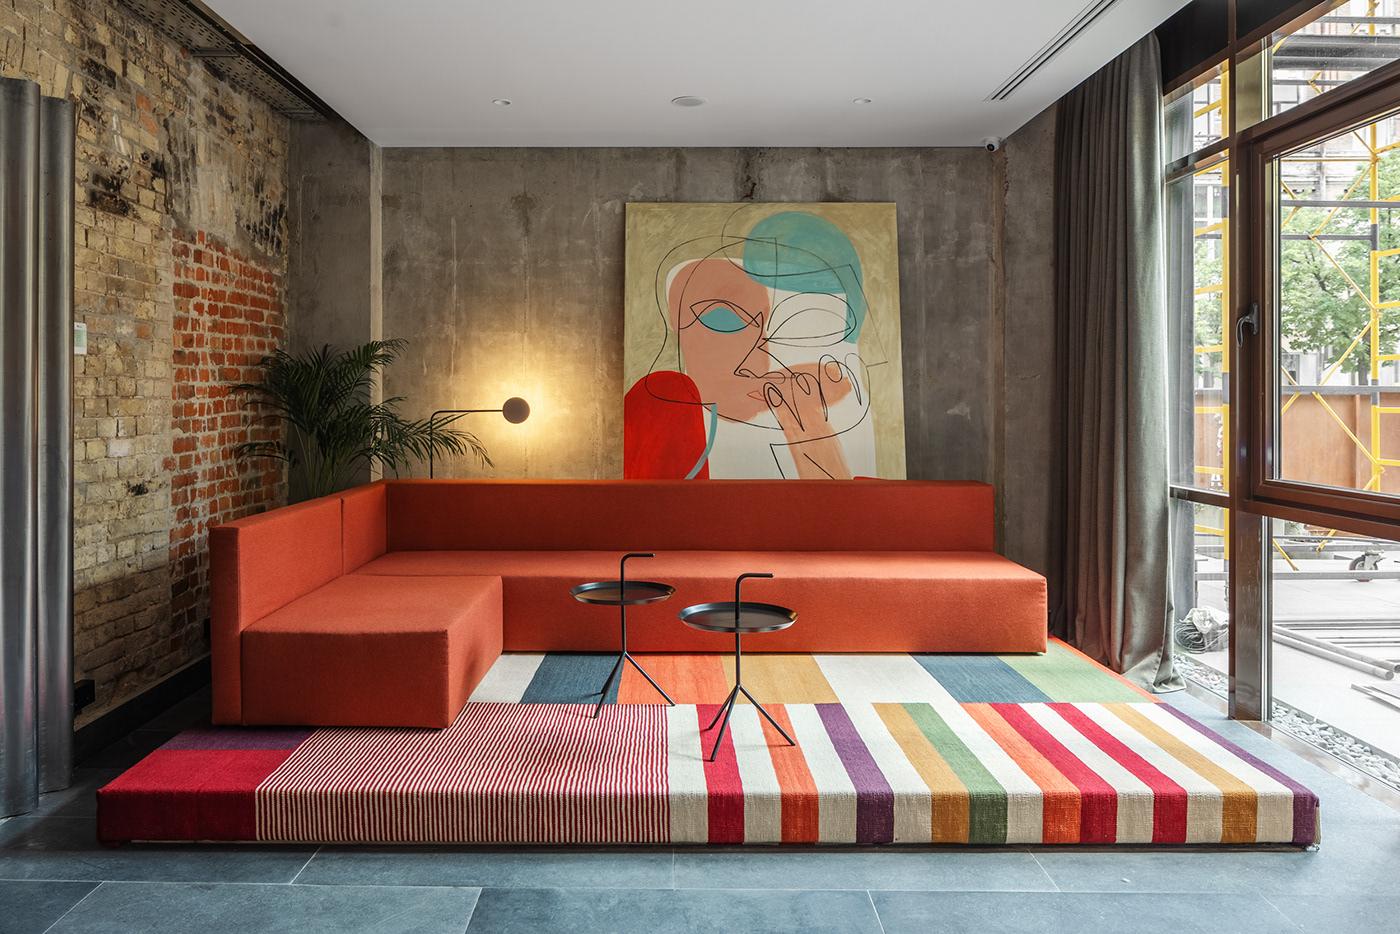 hotel interior design  hotel interior bauhaus designers balbek restaurant bar LOFT